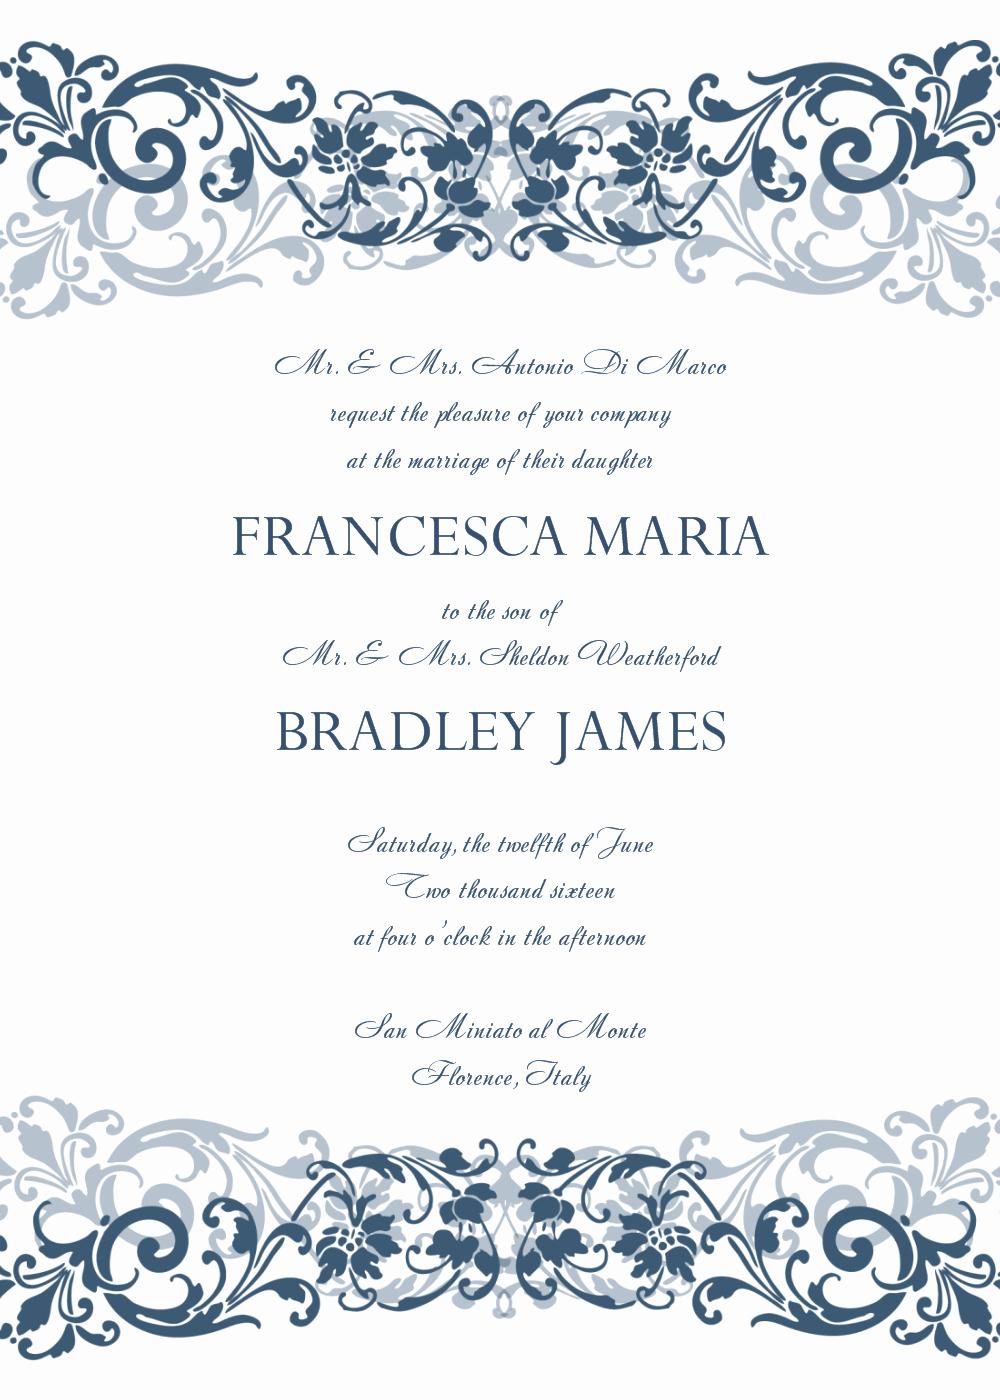 Free Templates for Invitations Luxury 8 Free Wedding Invitation Templates Excel Pdf formats